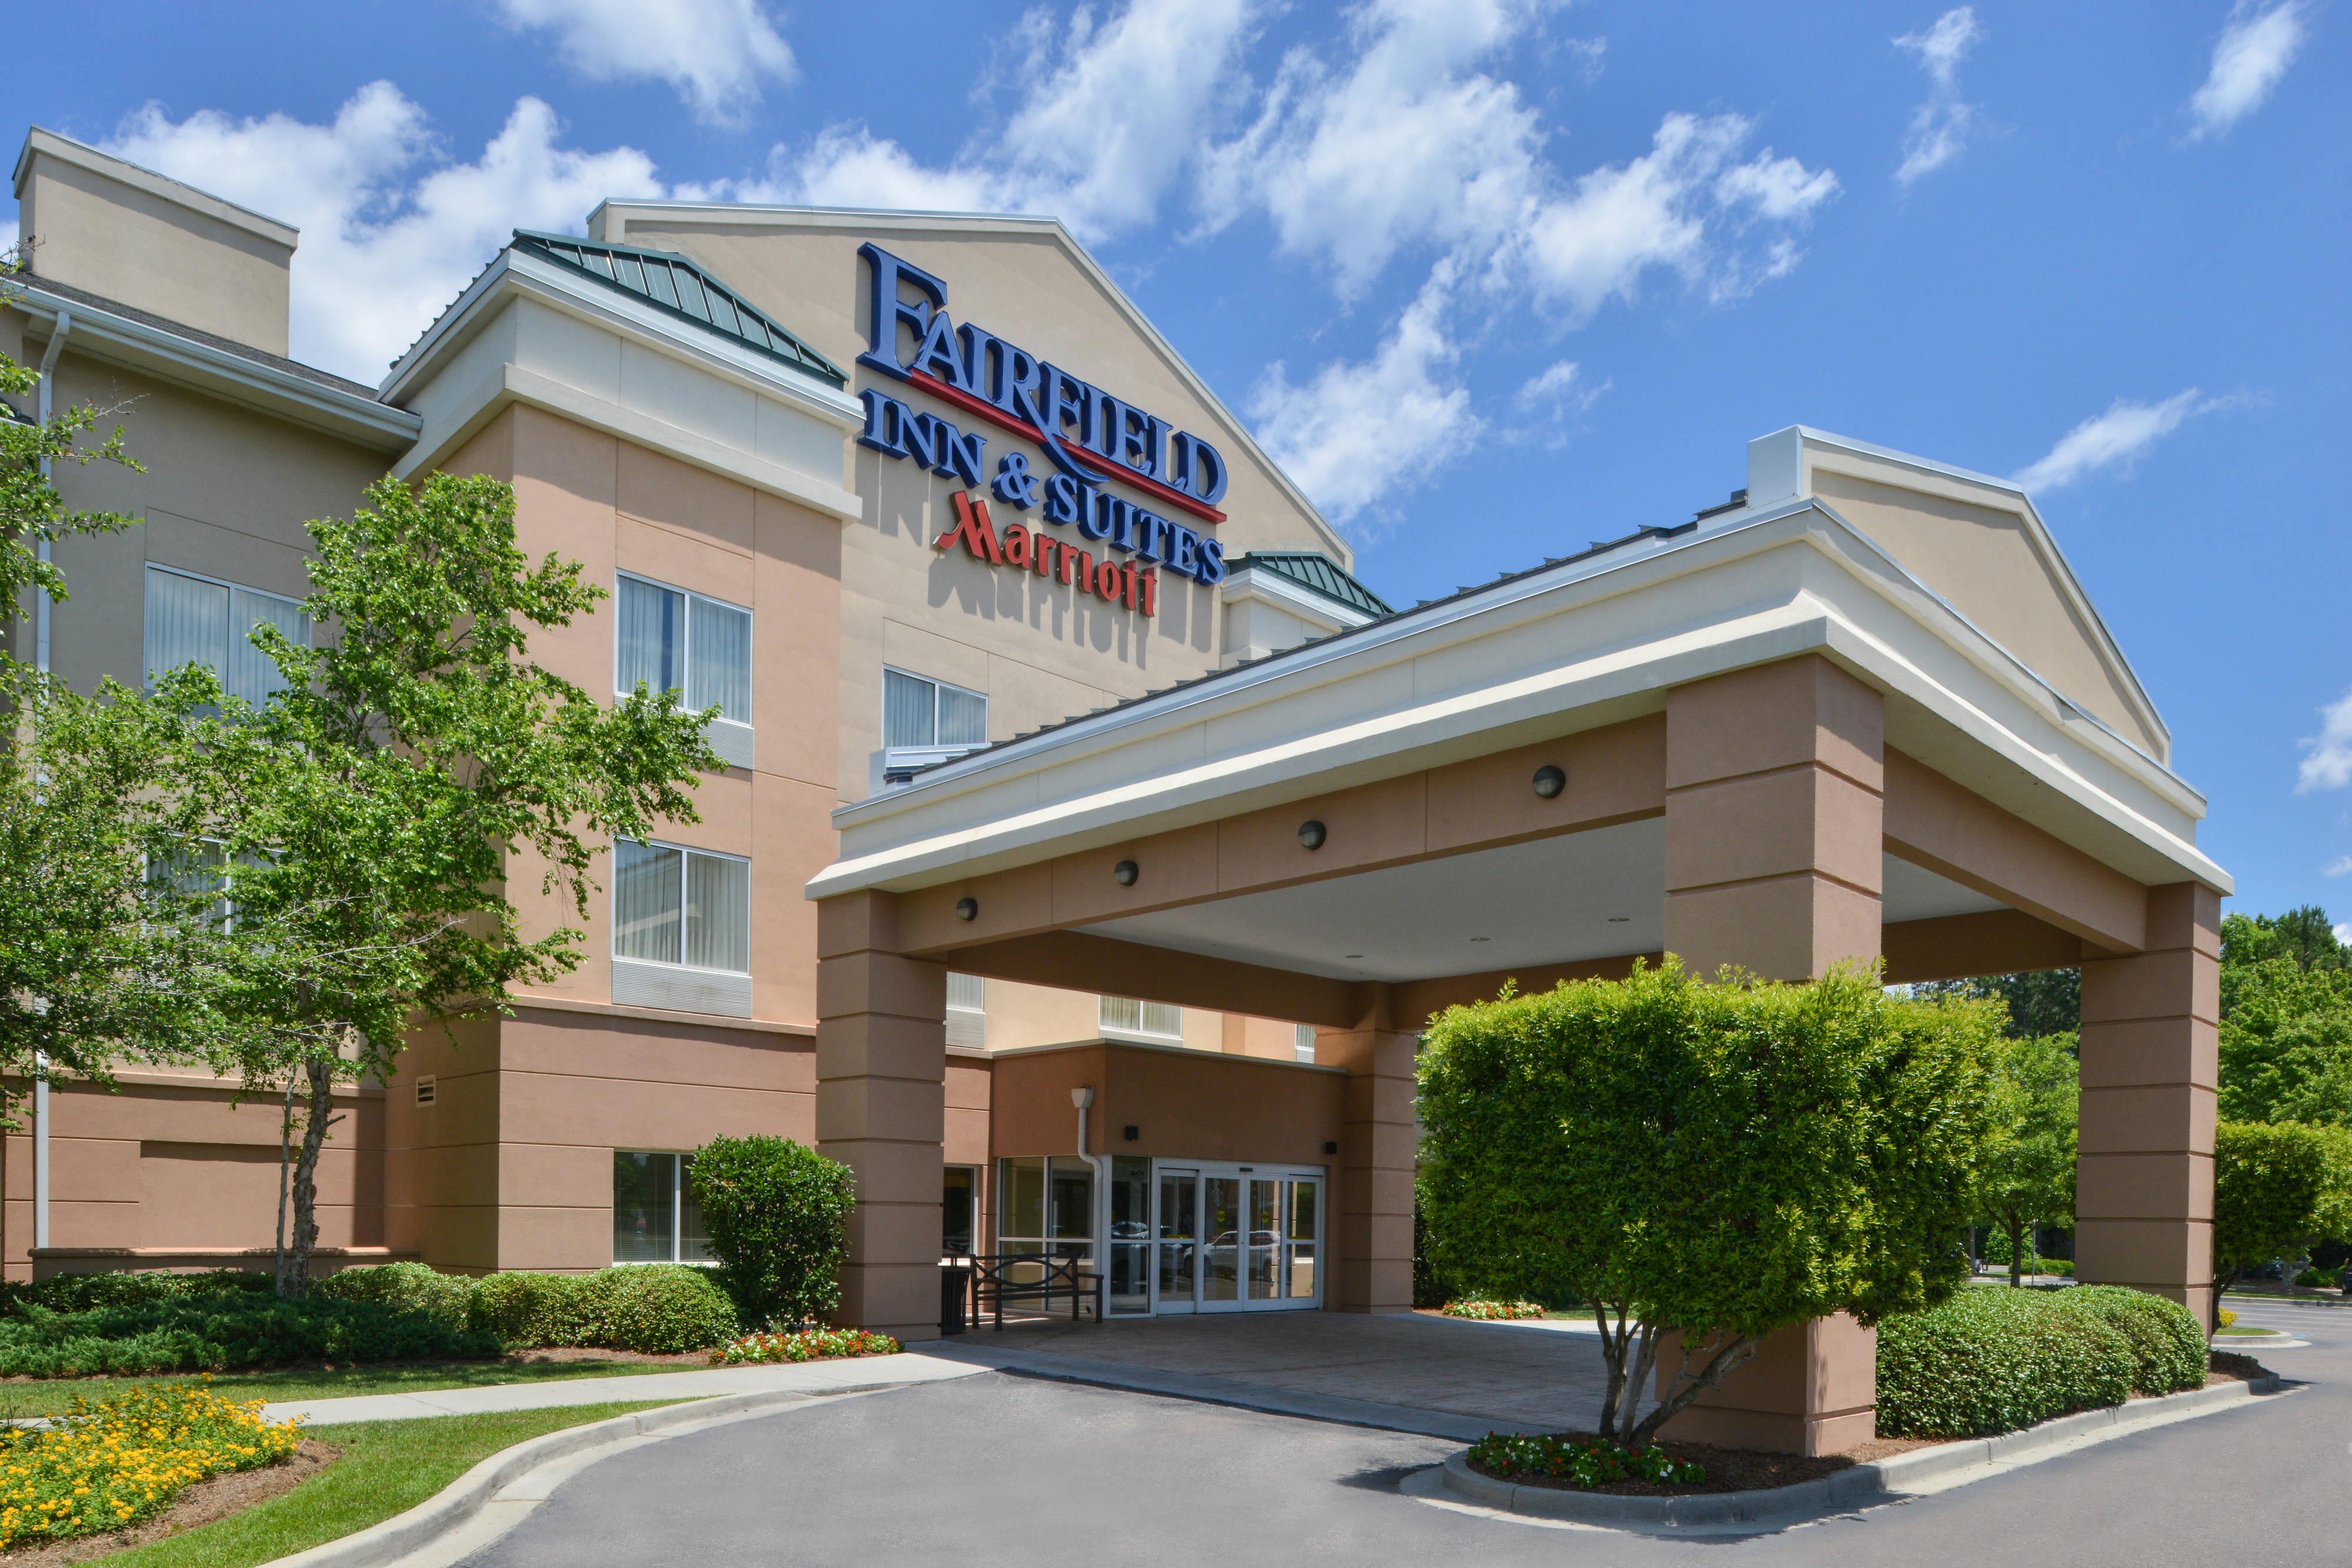 Fairfield Inn & Suites Charleston North/ University Area